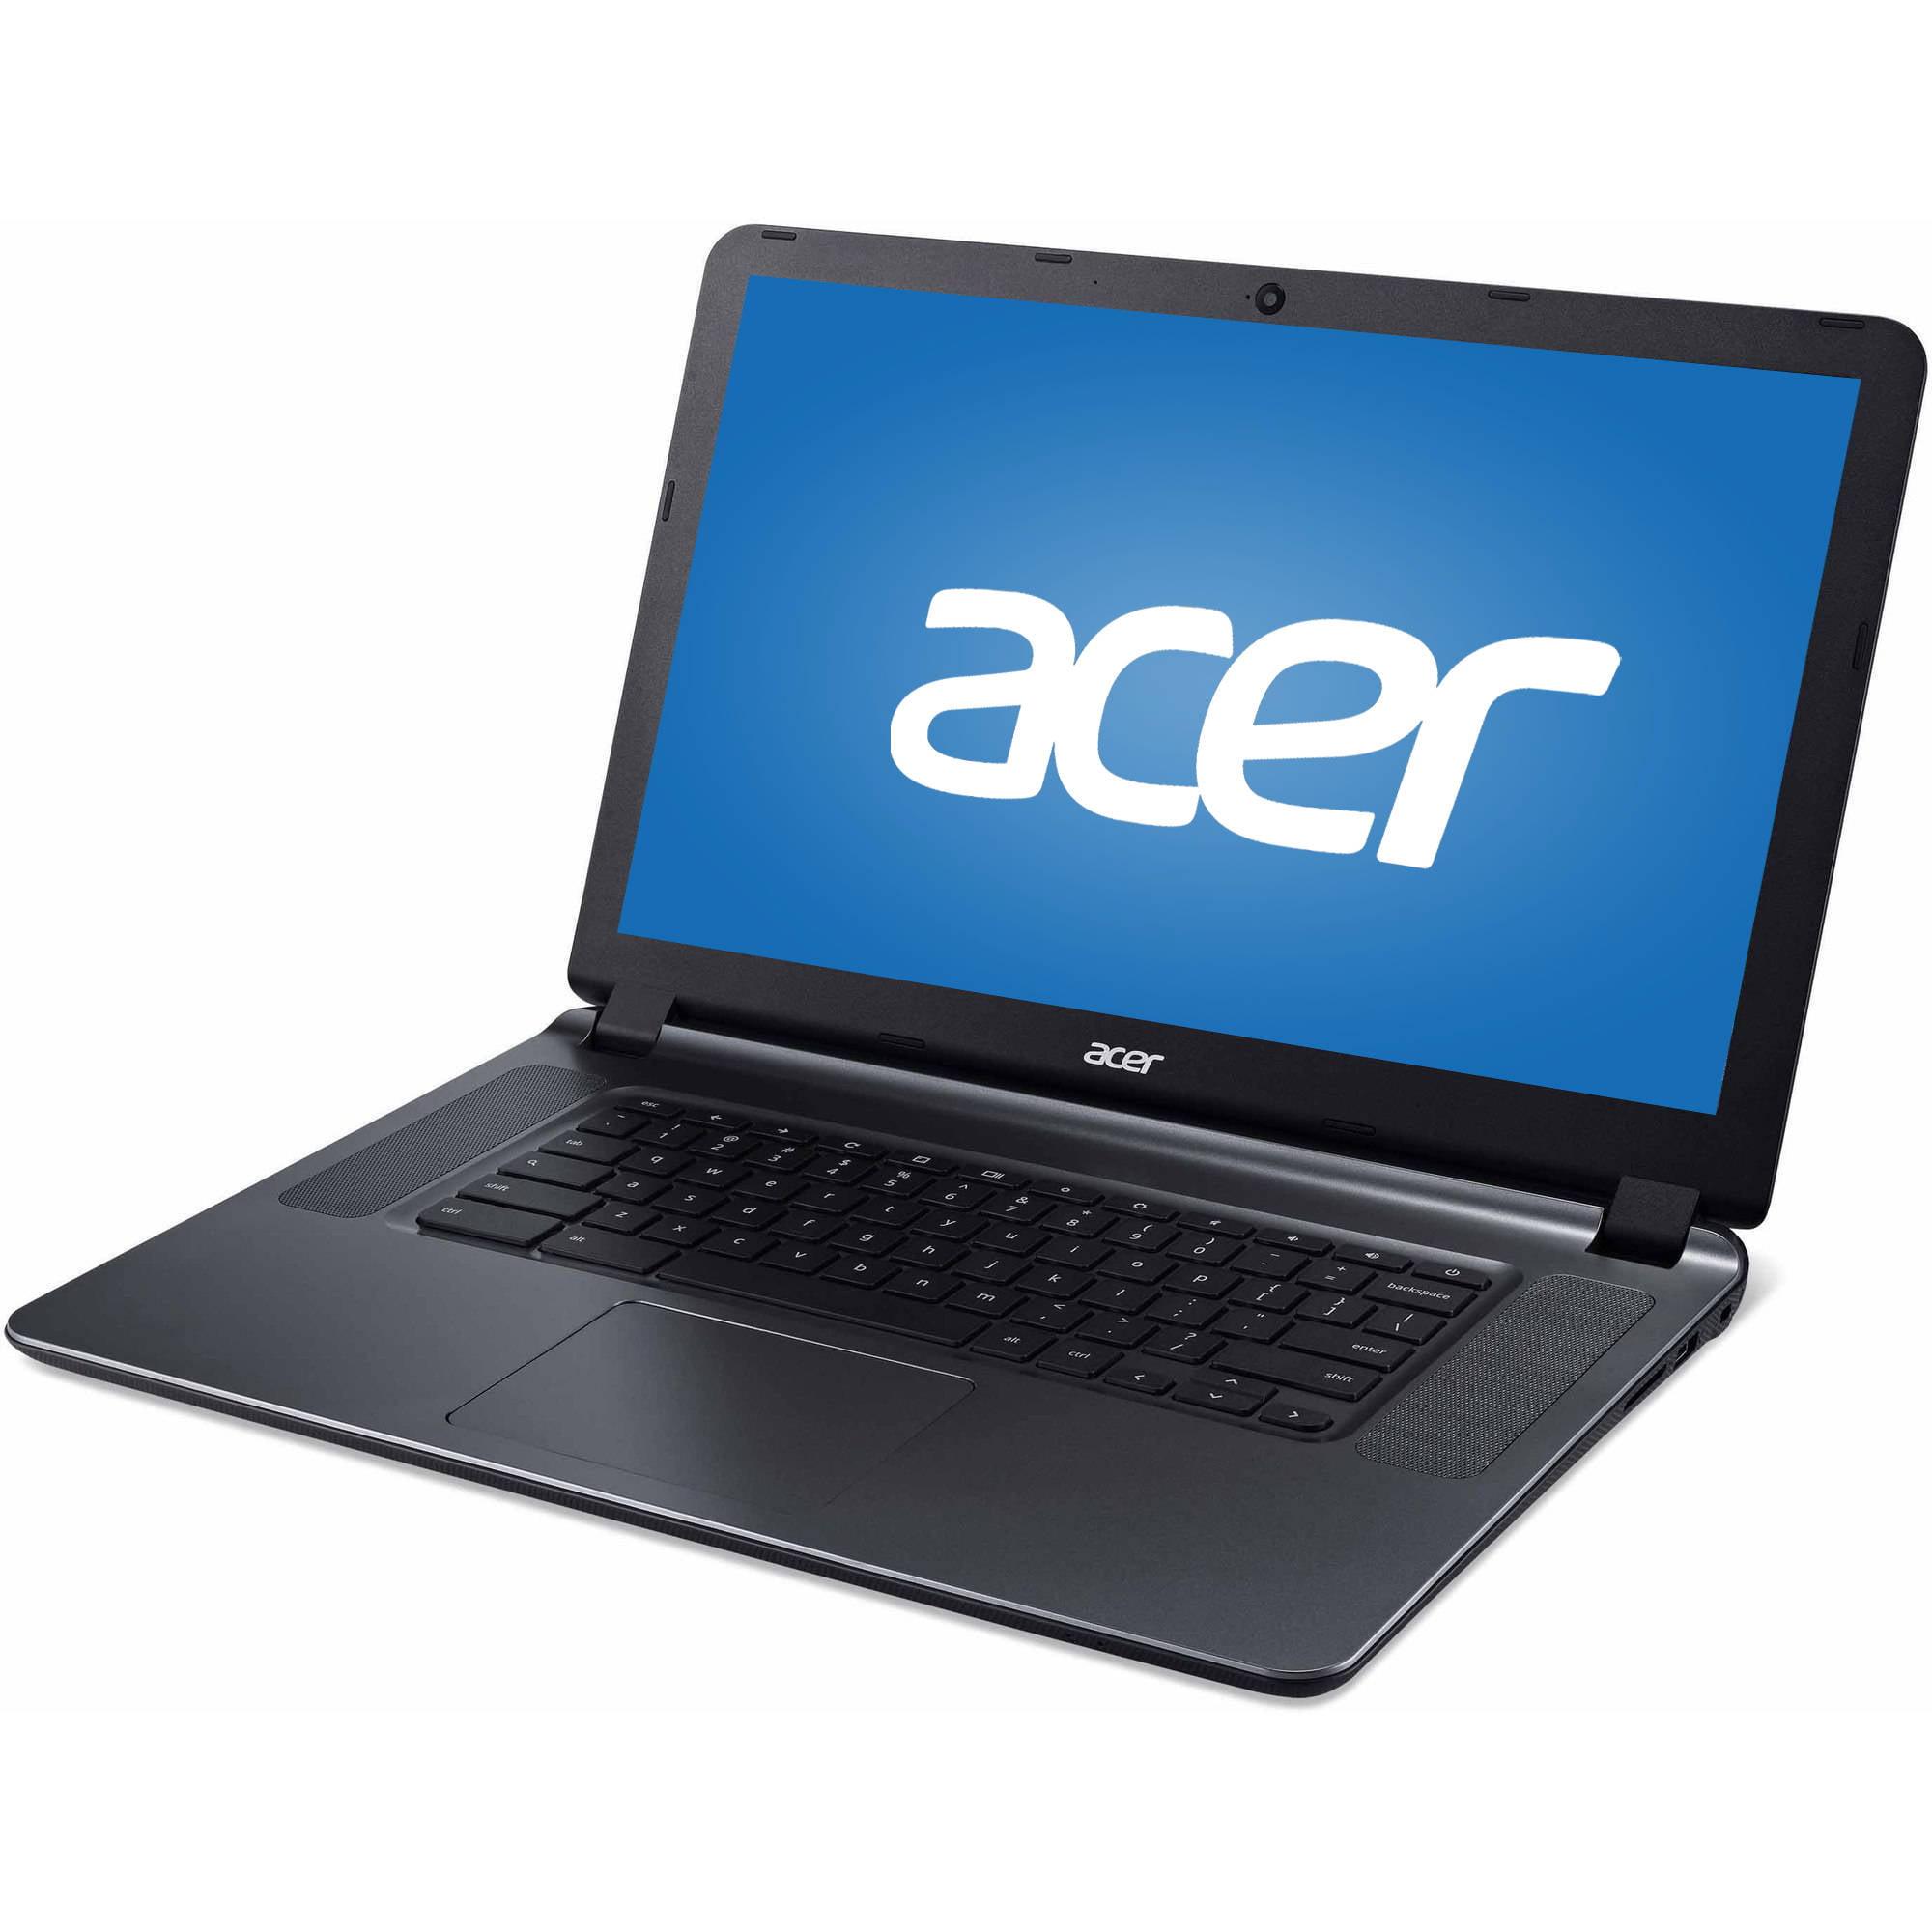 "Manufacturer Refurbished Acer CB3-532-C47C 15.6"" Chromebook, Chrome OS, Intel Celeron N3060 Processor, 2GB RAM, 16GB Flash Drive"